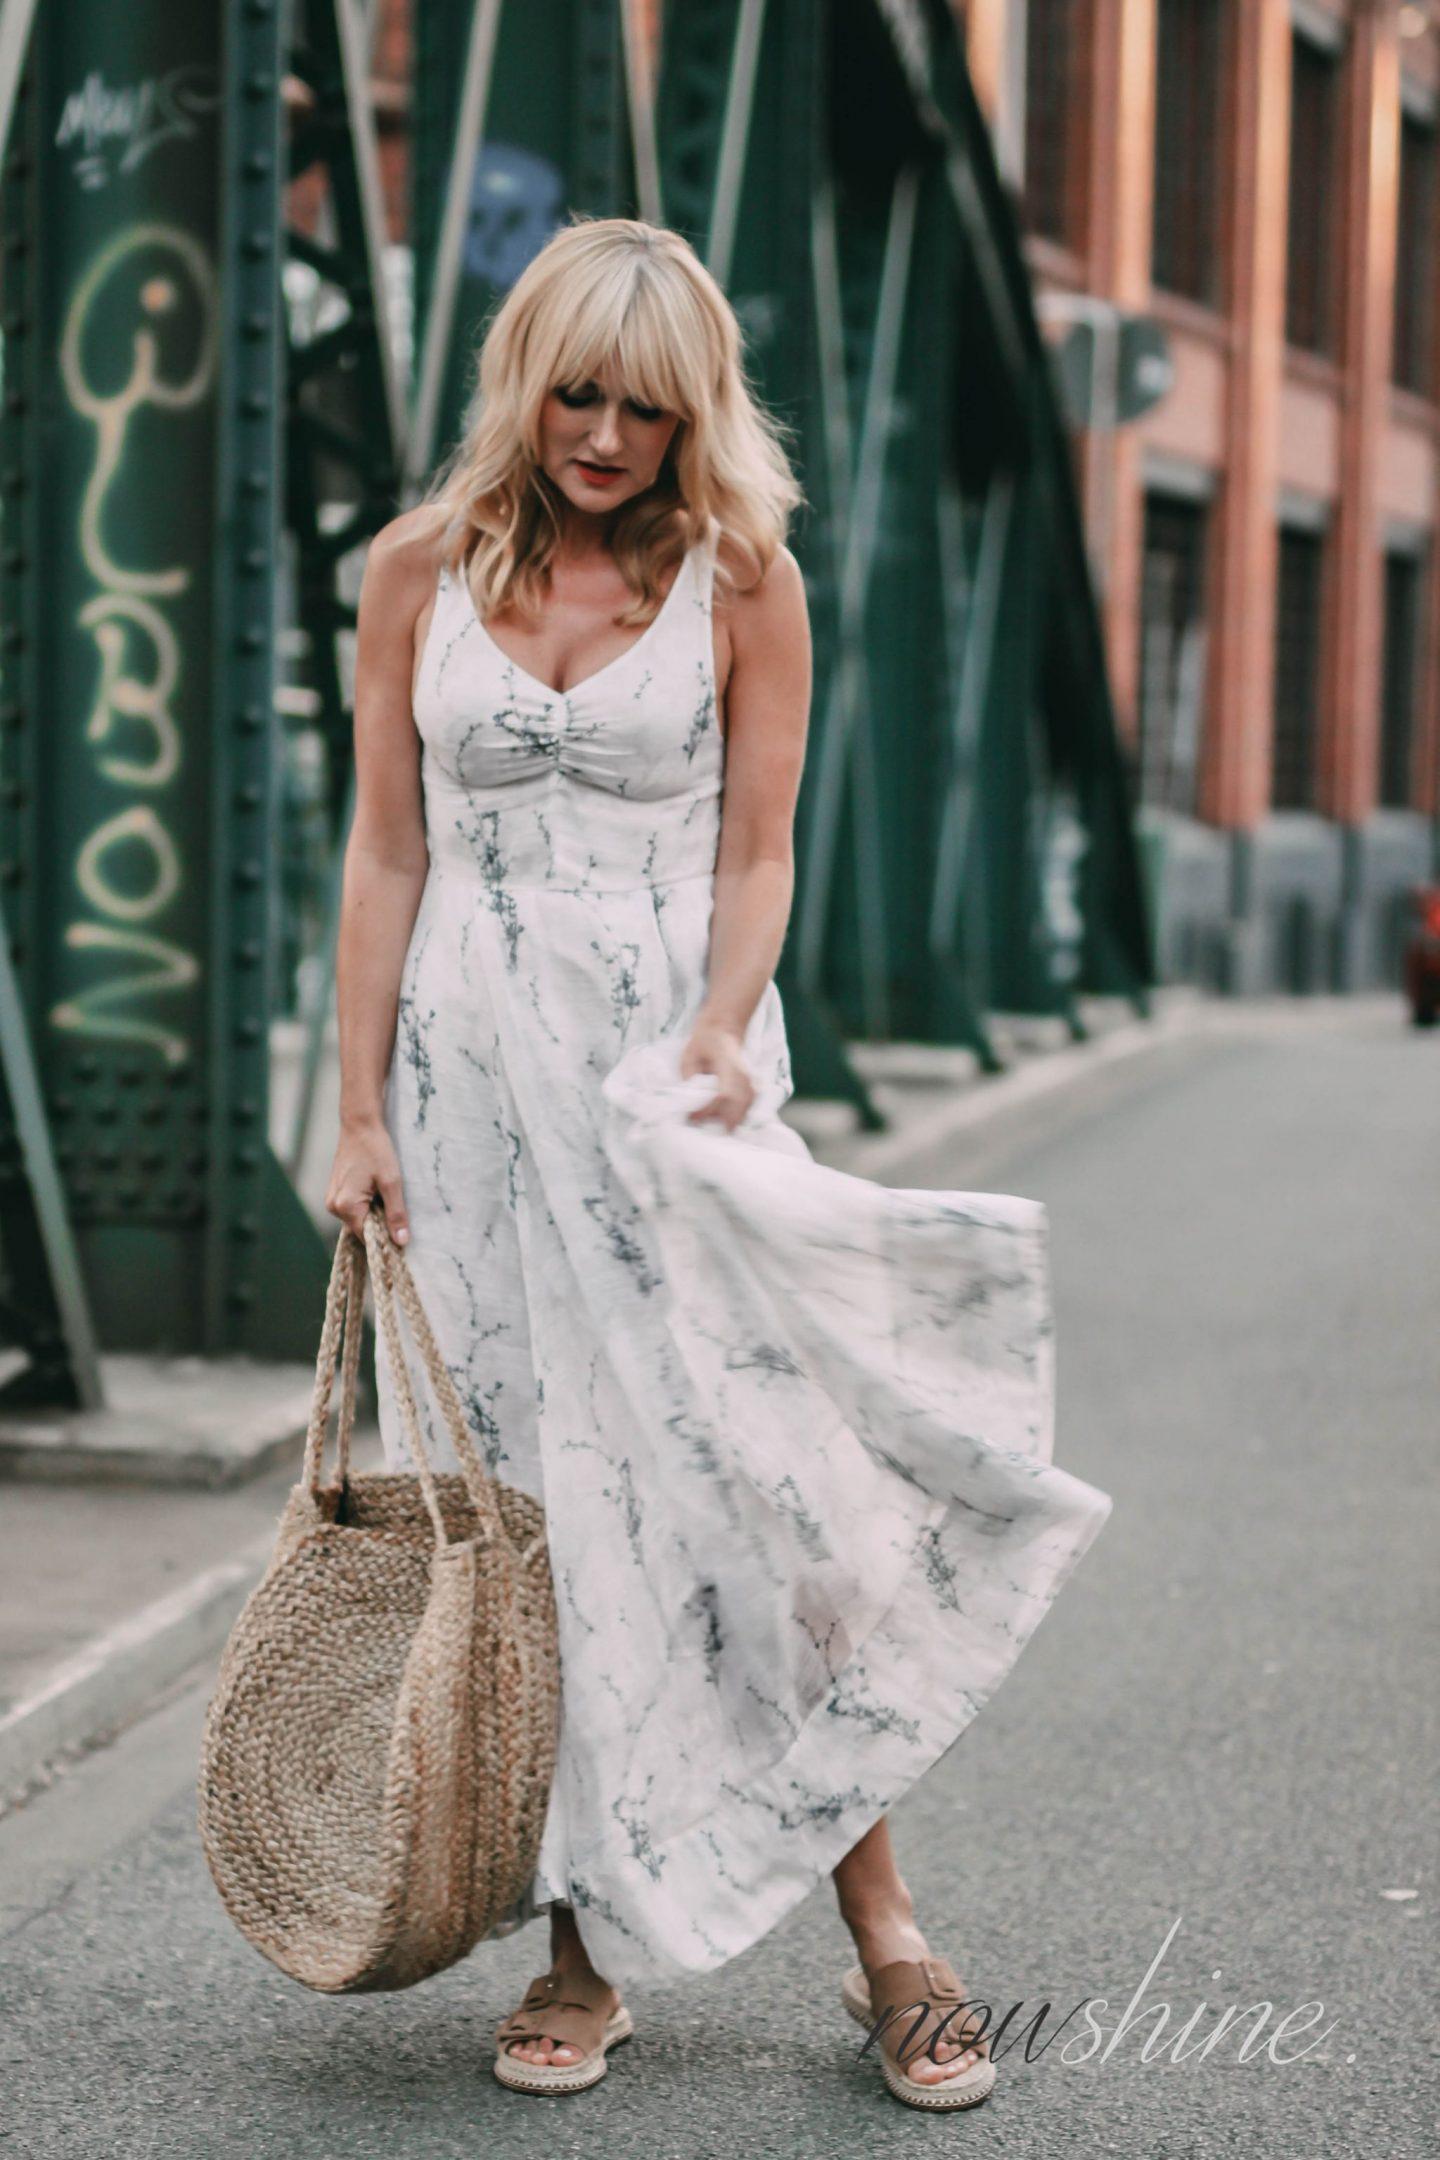 Conscious Exclusive 2018 Kleid von H&M - Nowshine Mode ab 40